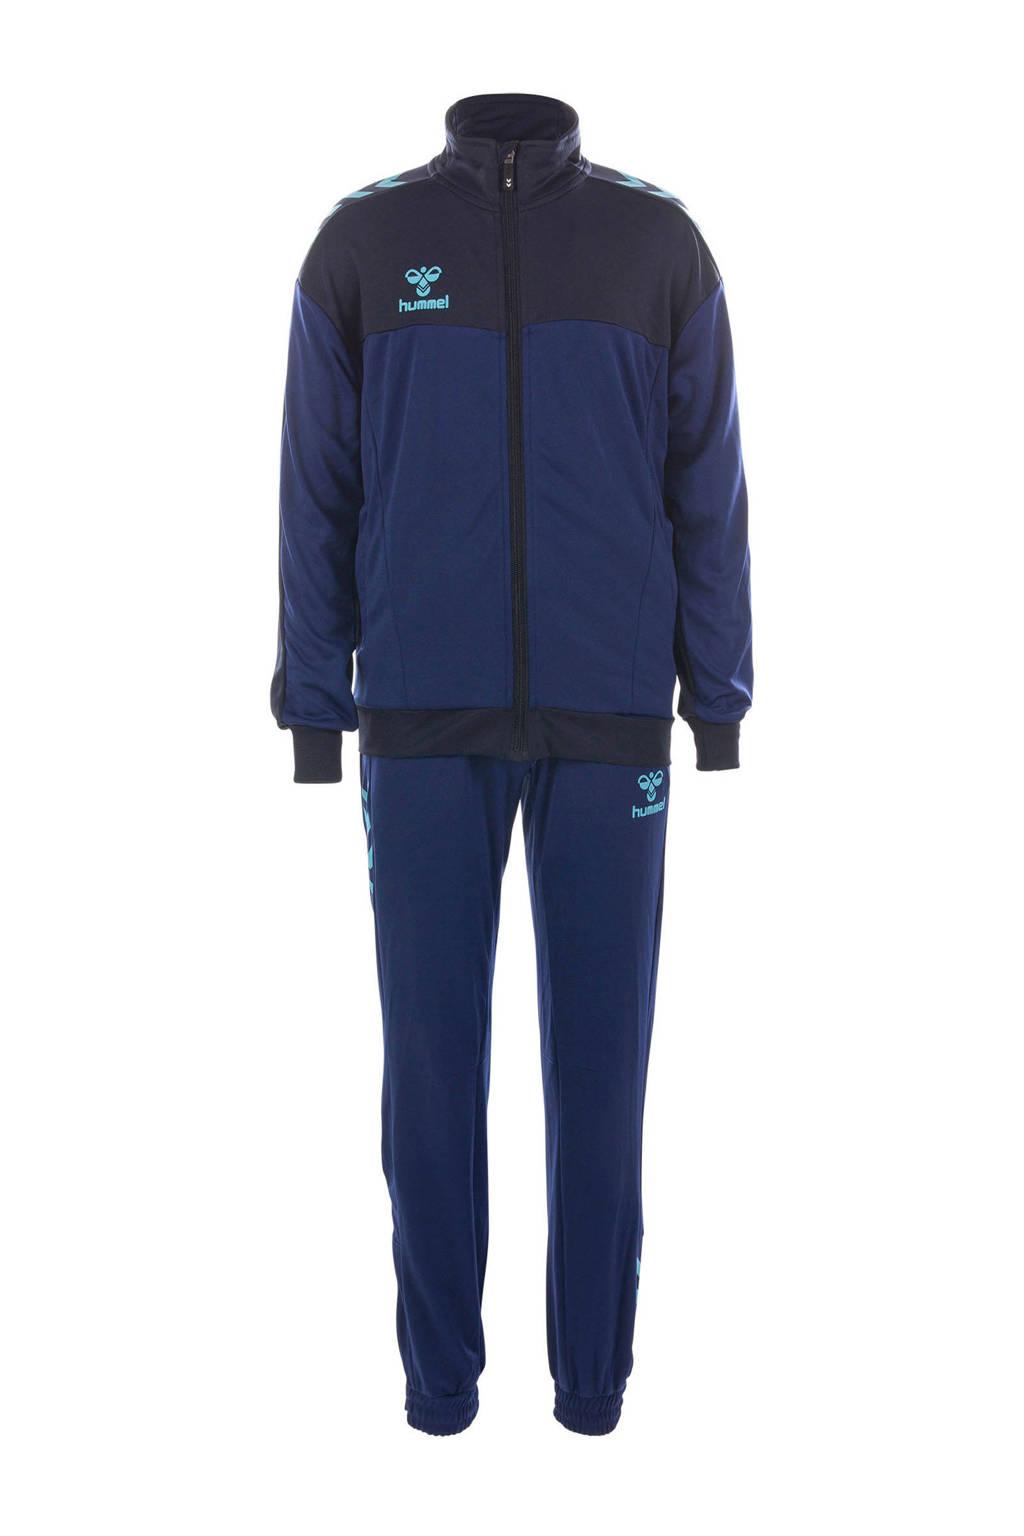 hummel   trainingspak, Donkerblauw/blauw